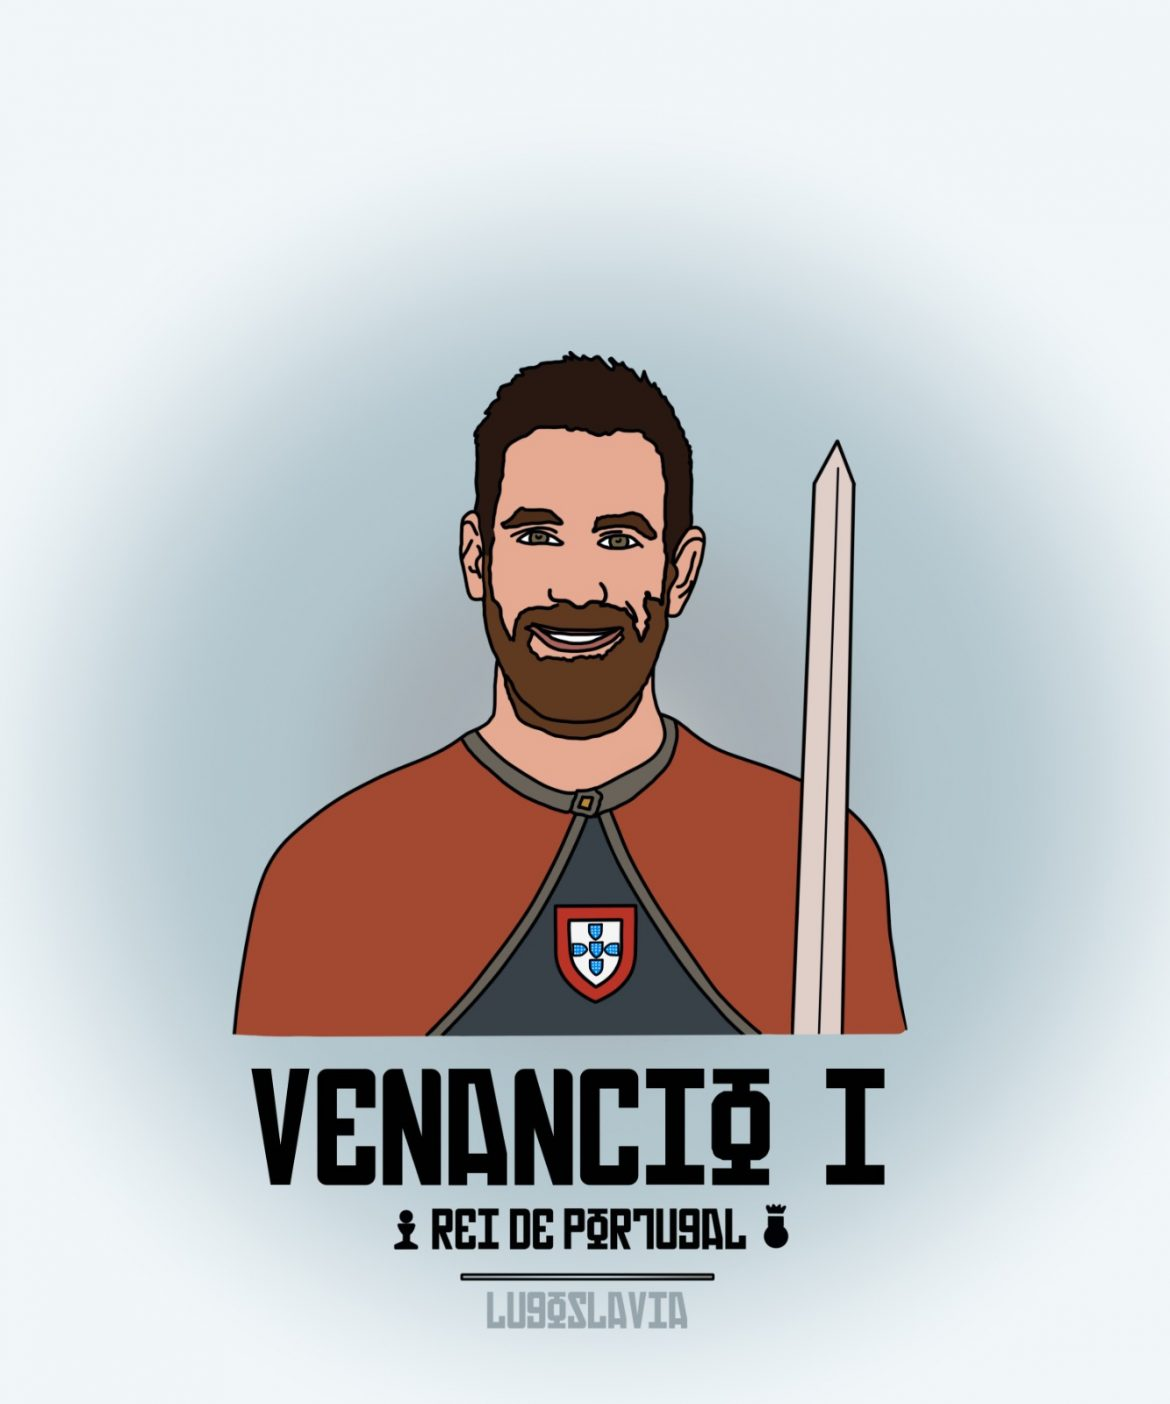 Frederico Venâncio